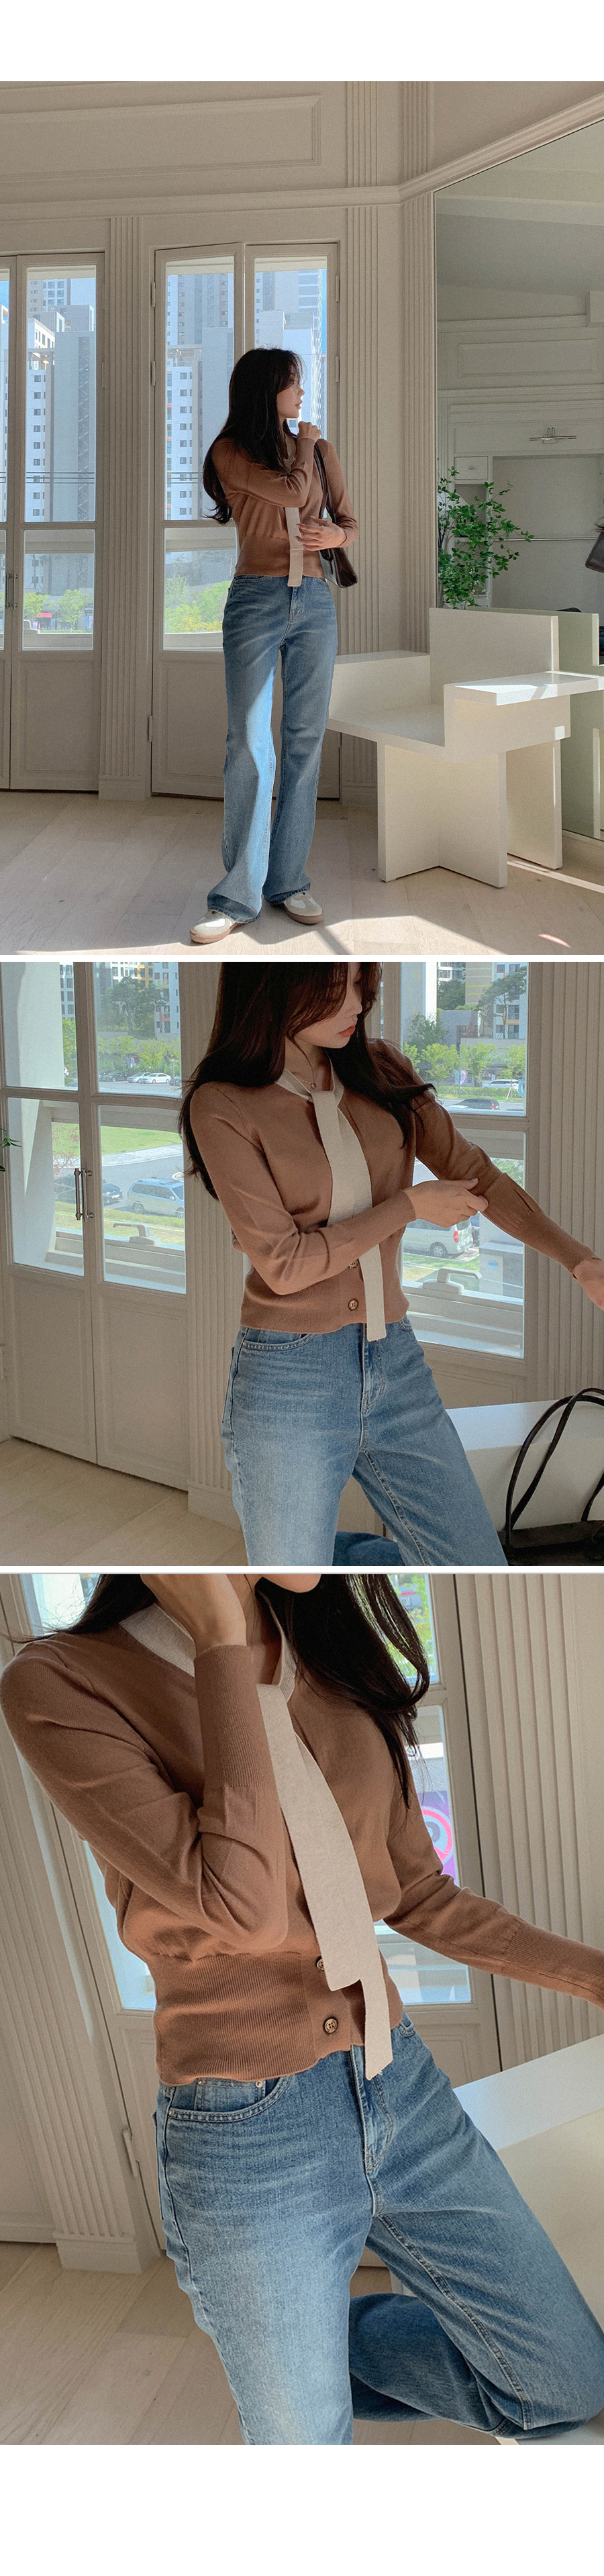 First Love Image Ribbon Blouse Knitwear